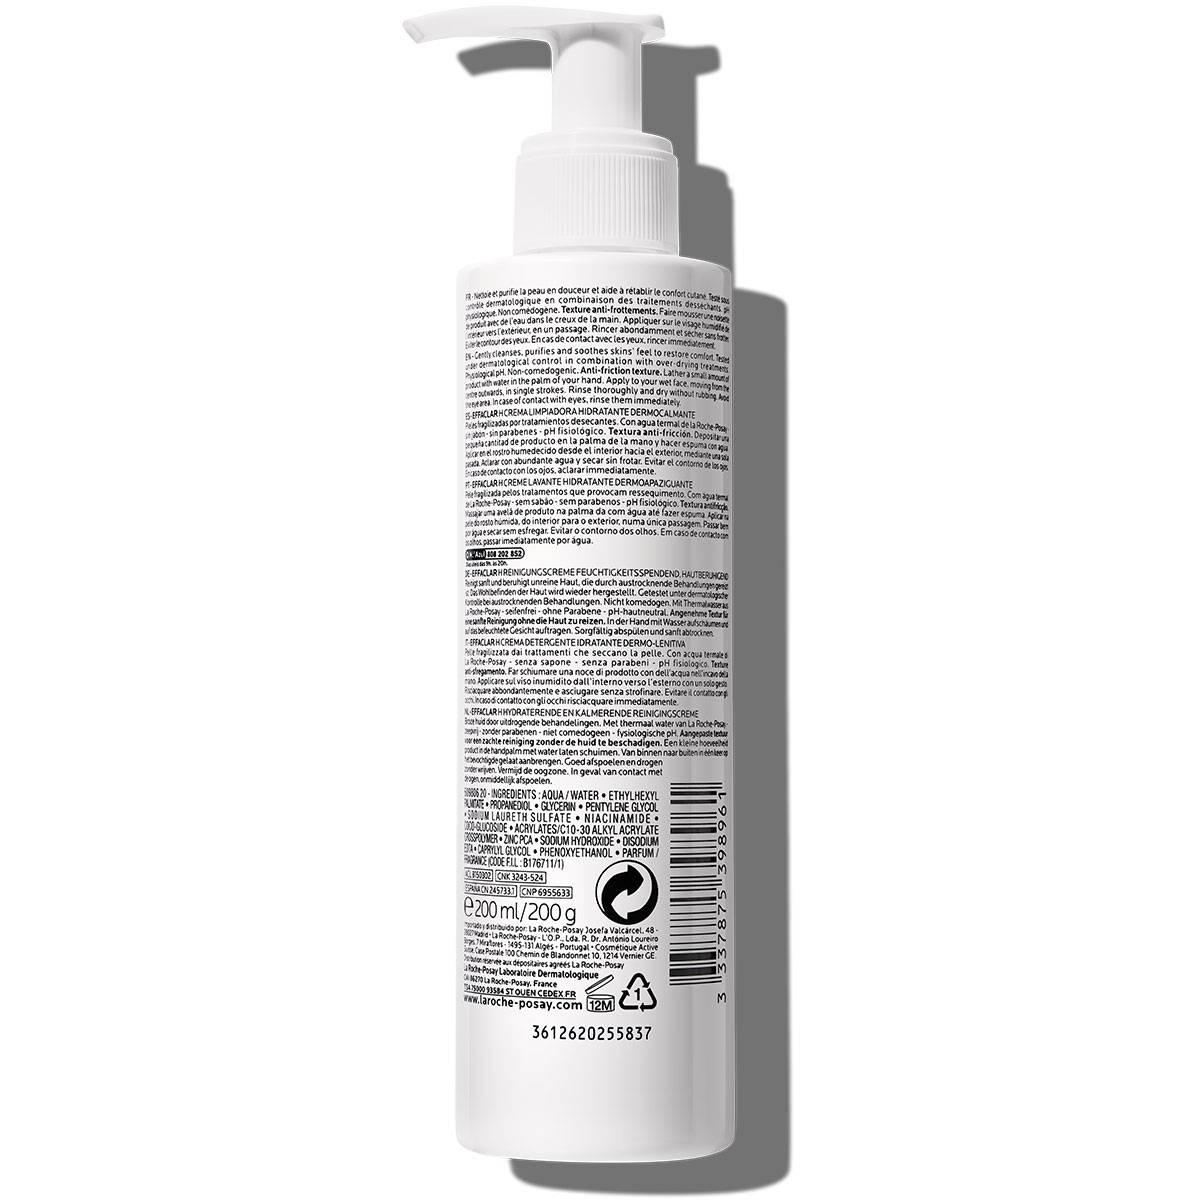 La Roche Posay Face Cleanser Effaclar H Cleansing Cream 200ml 33378753